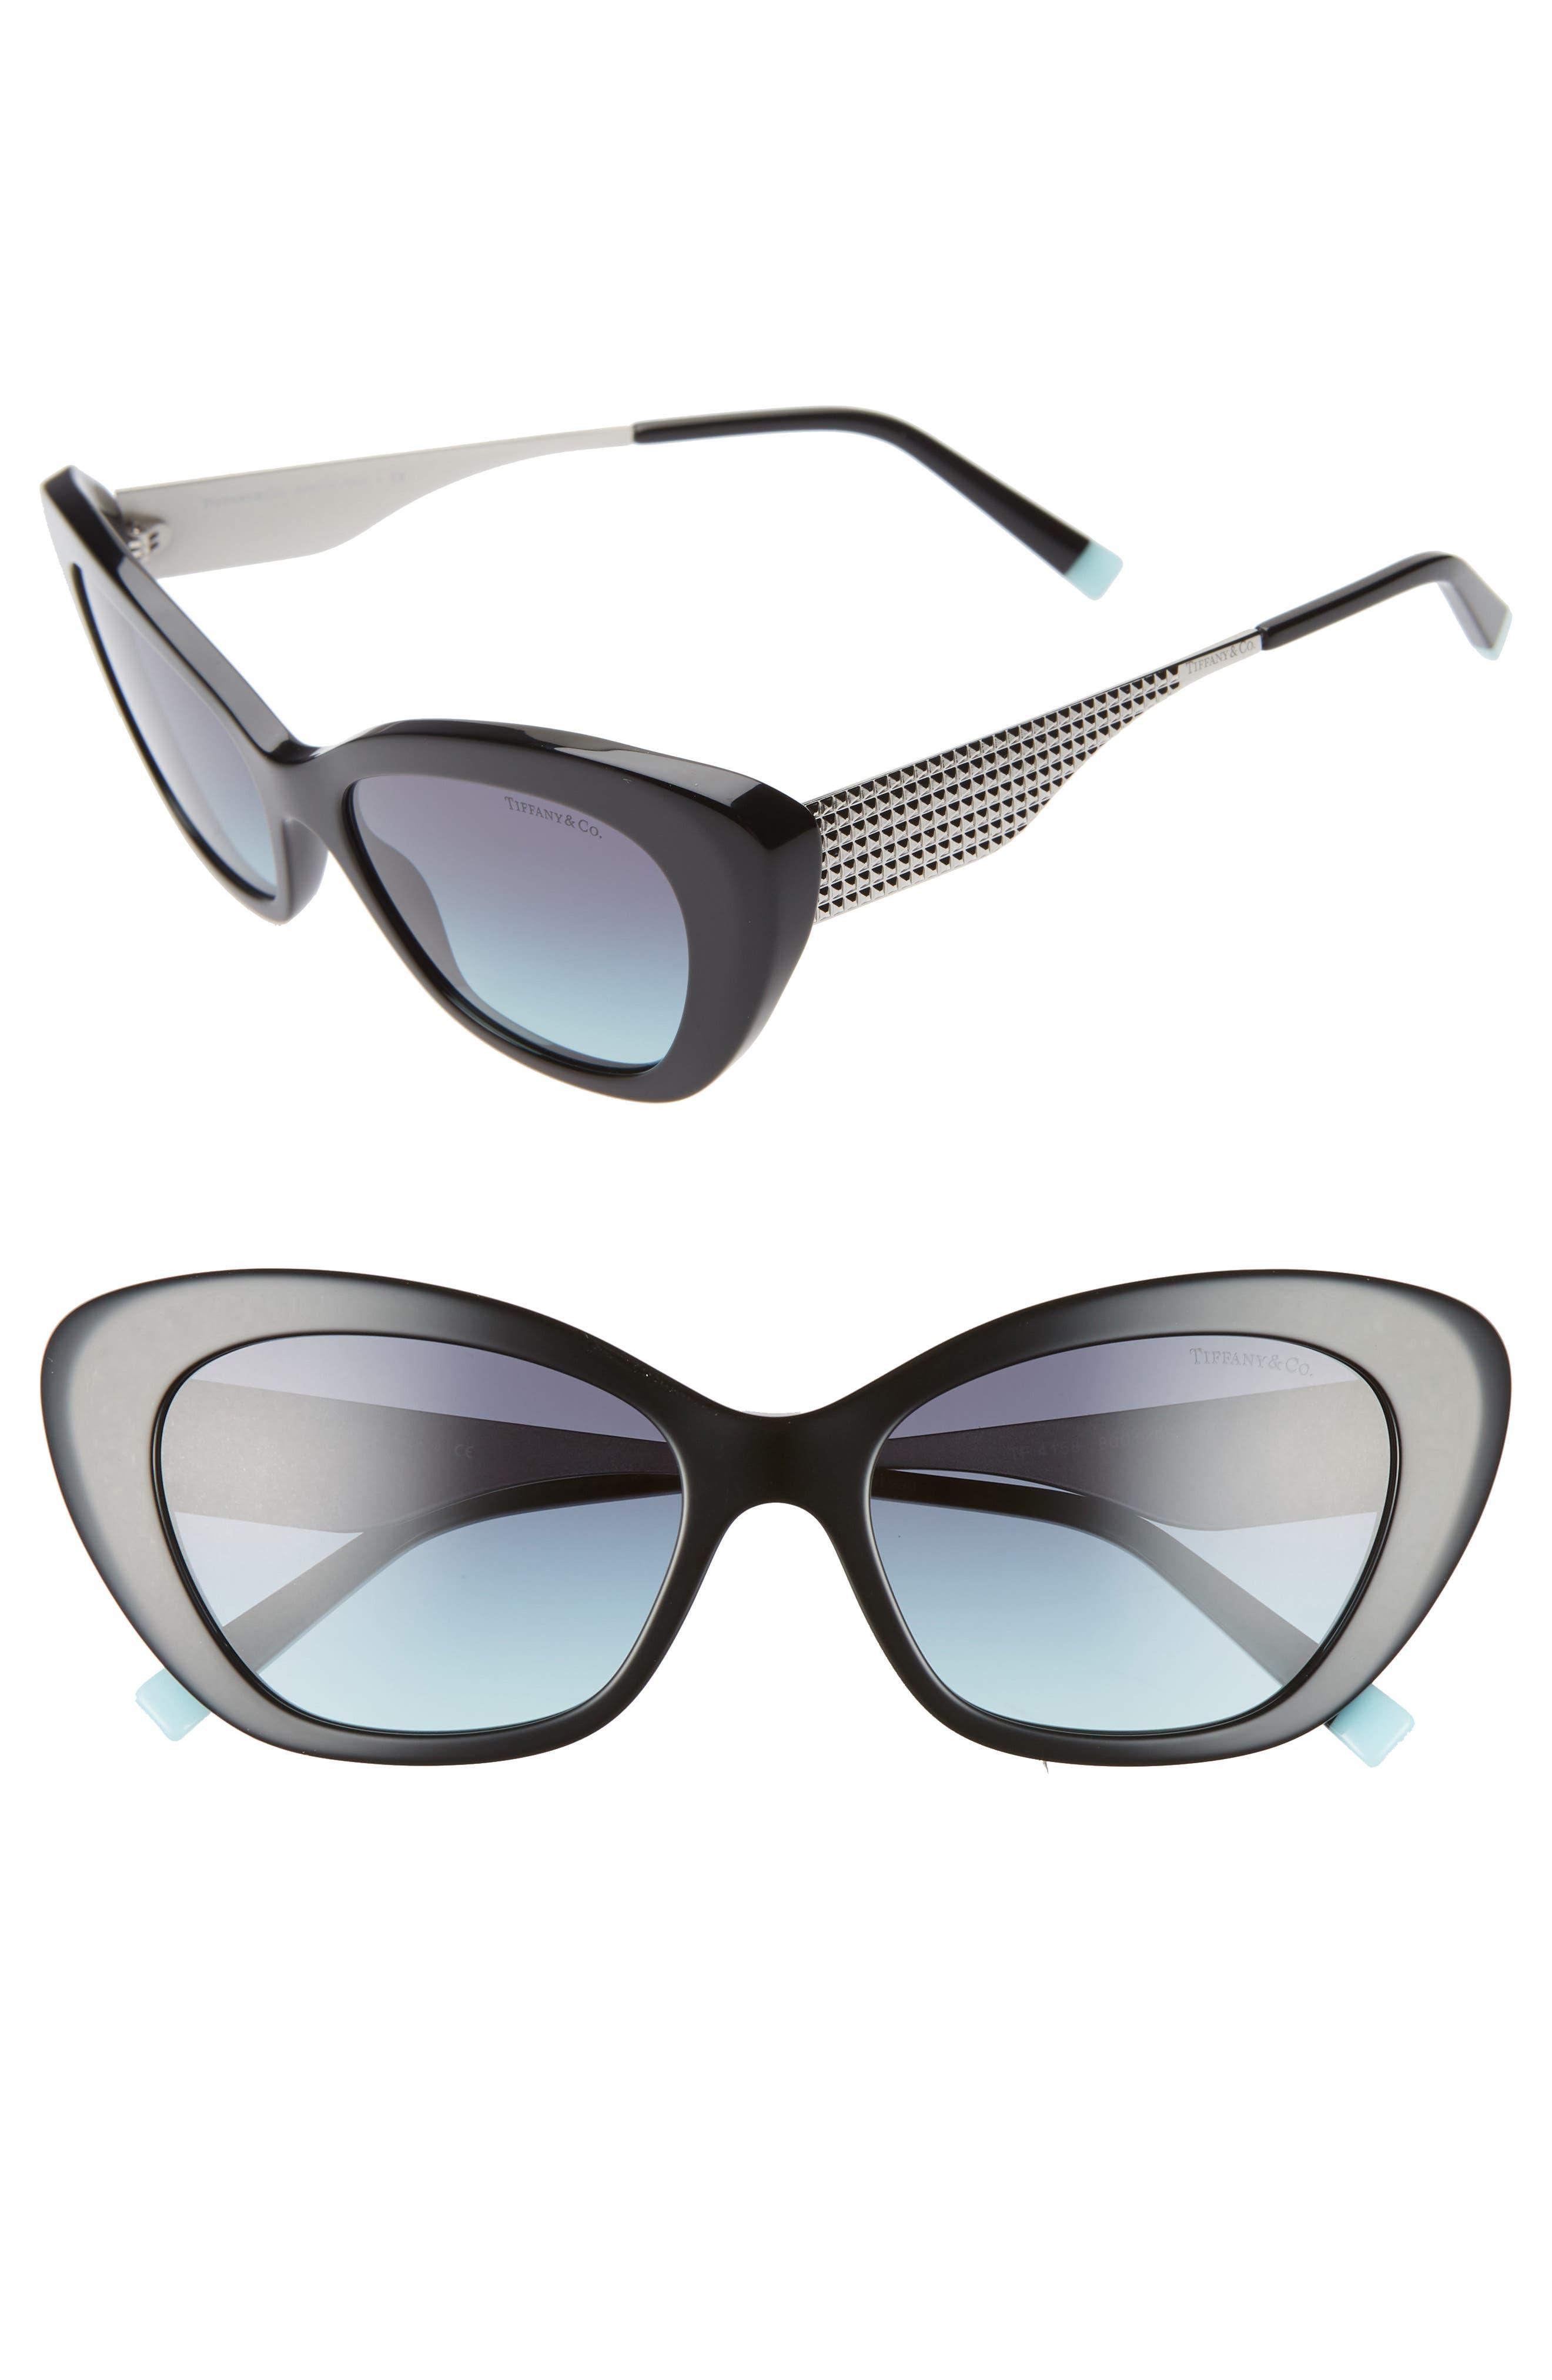 416c778110 Women s Tiffany   Co. Cat-Eye Sunglasses